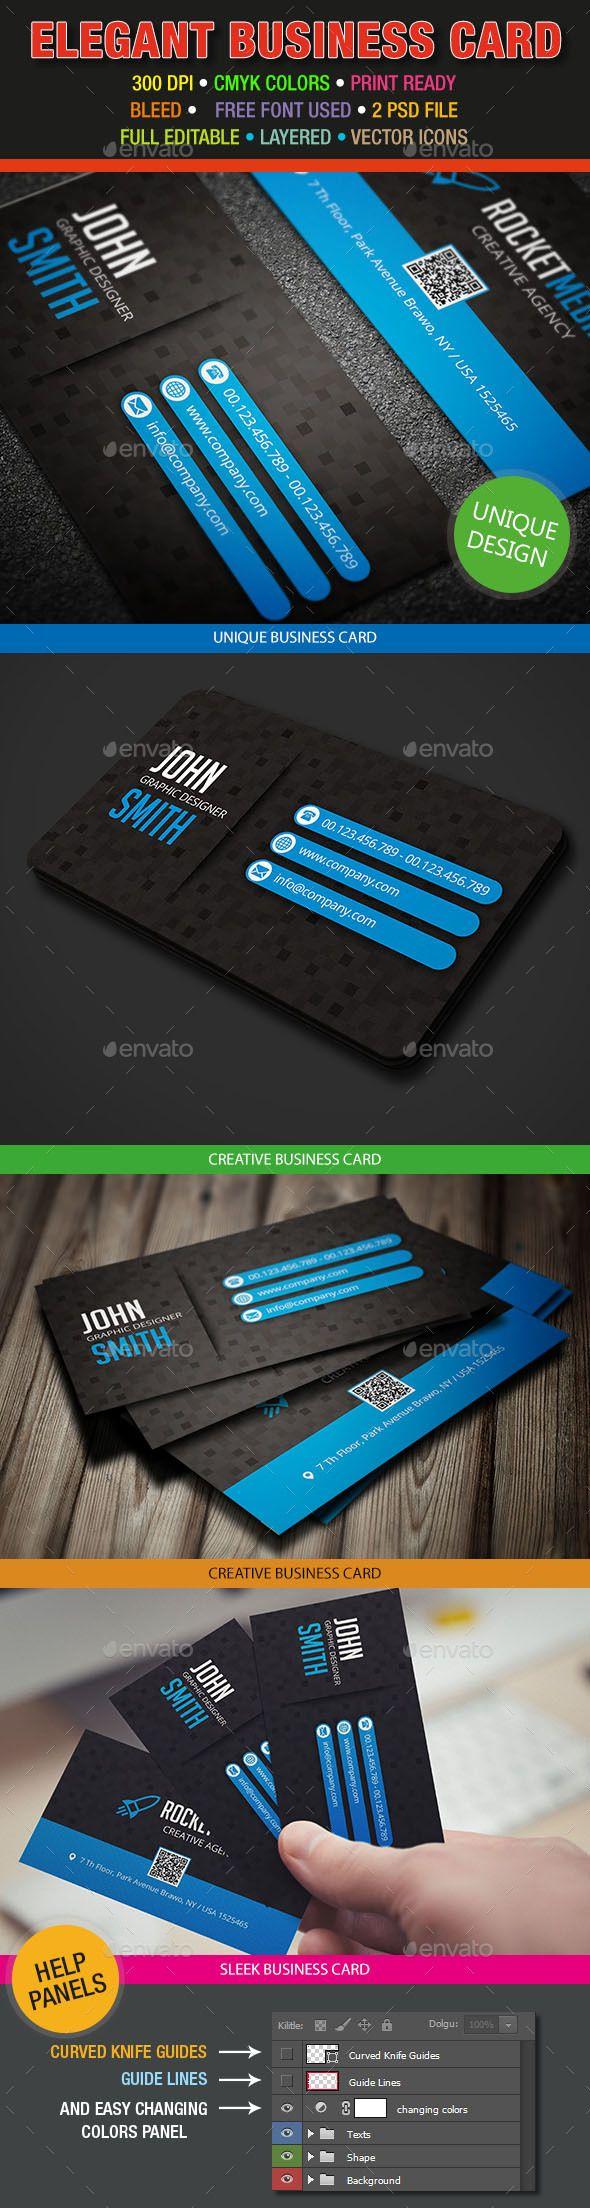 Elegant Business Card 386